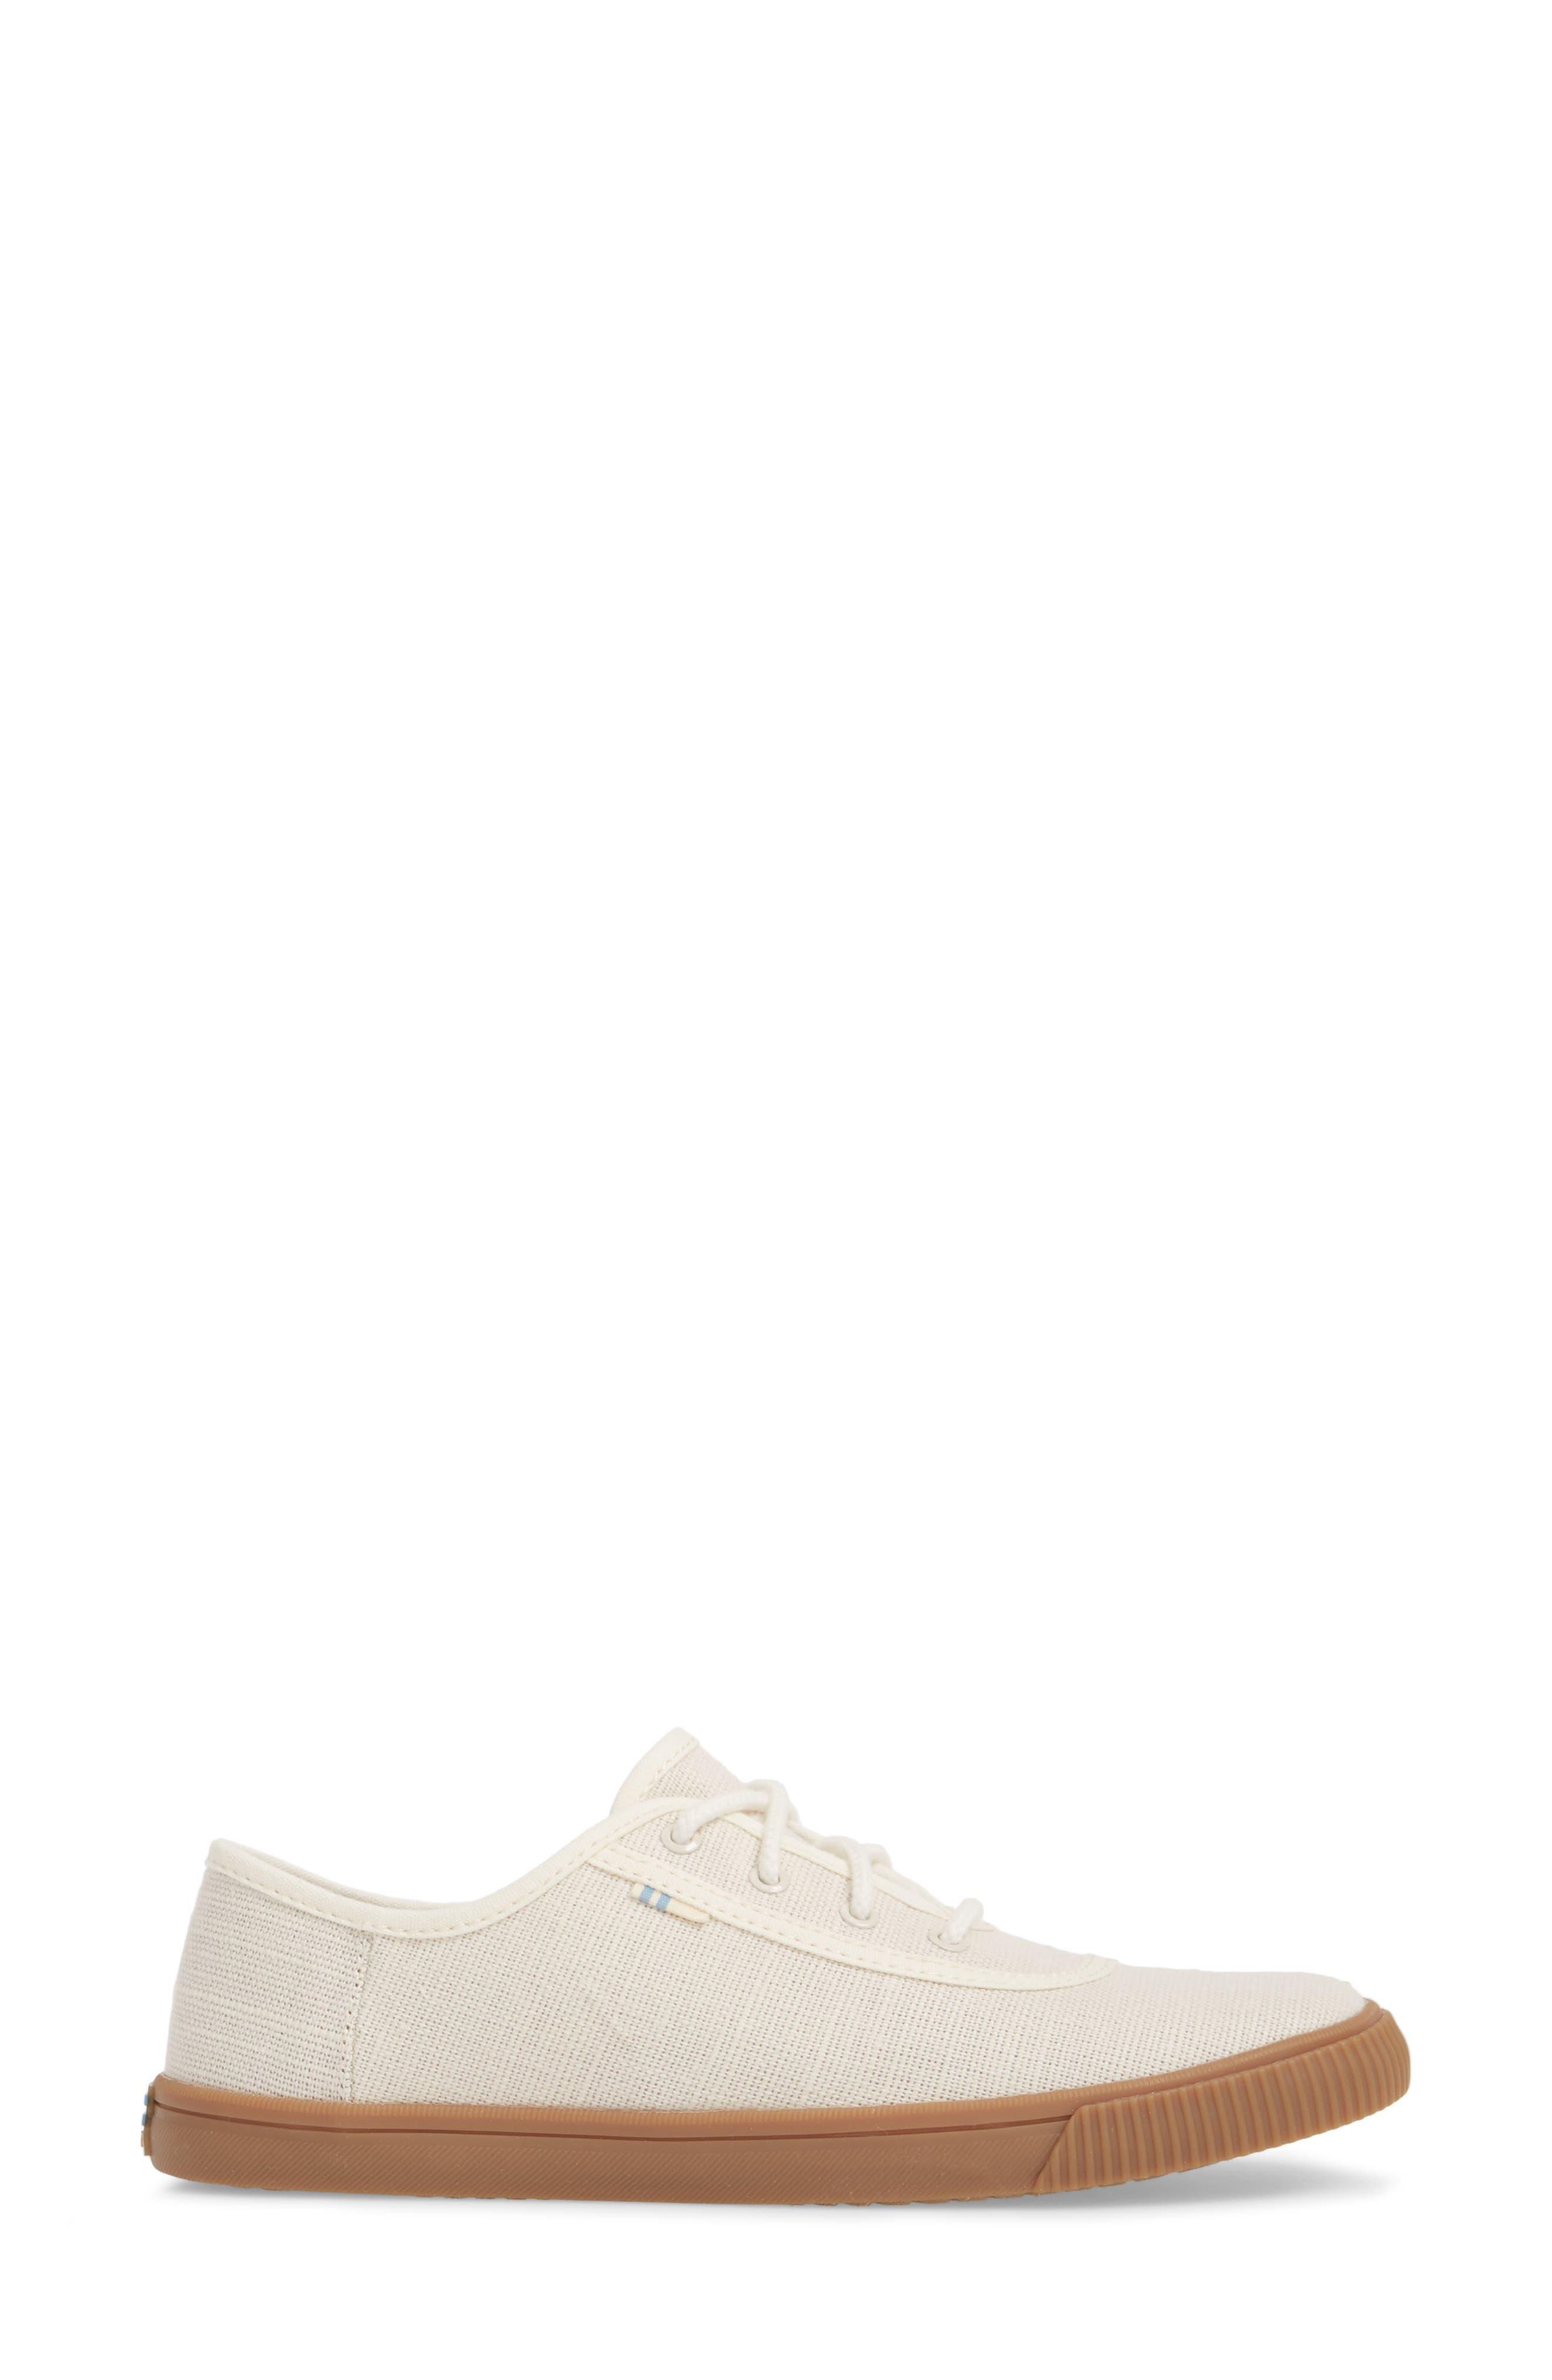 Carmel Sneaker,                             Alternate thumbnail 3, color,                             BIRCH HERITAGE CANVAS